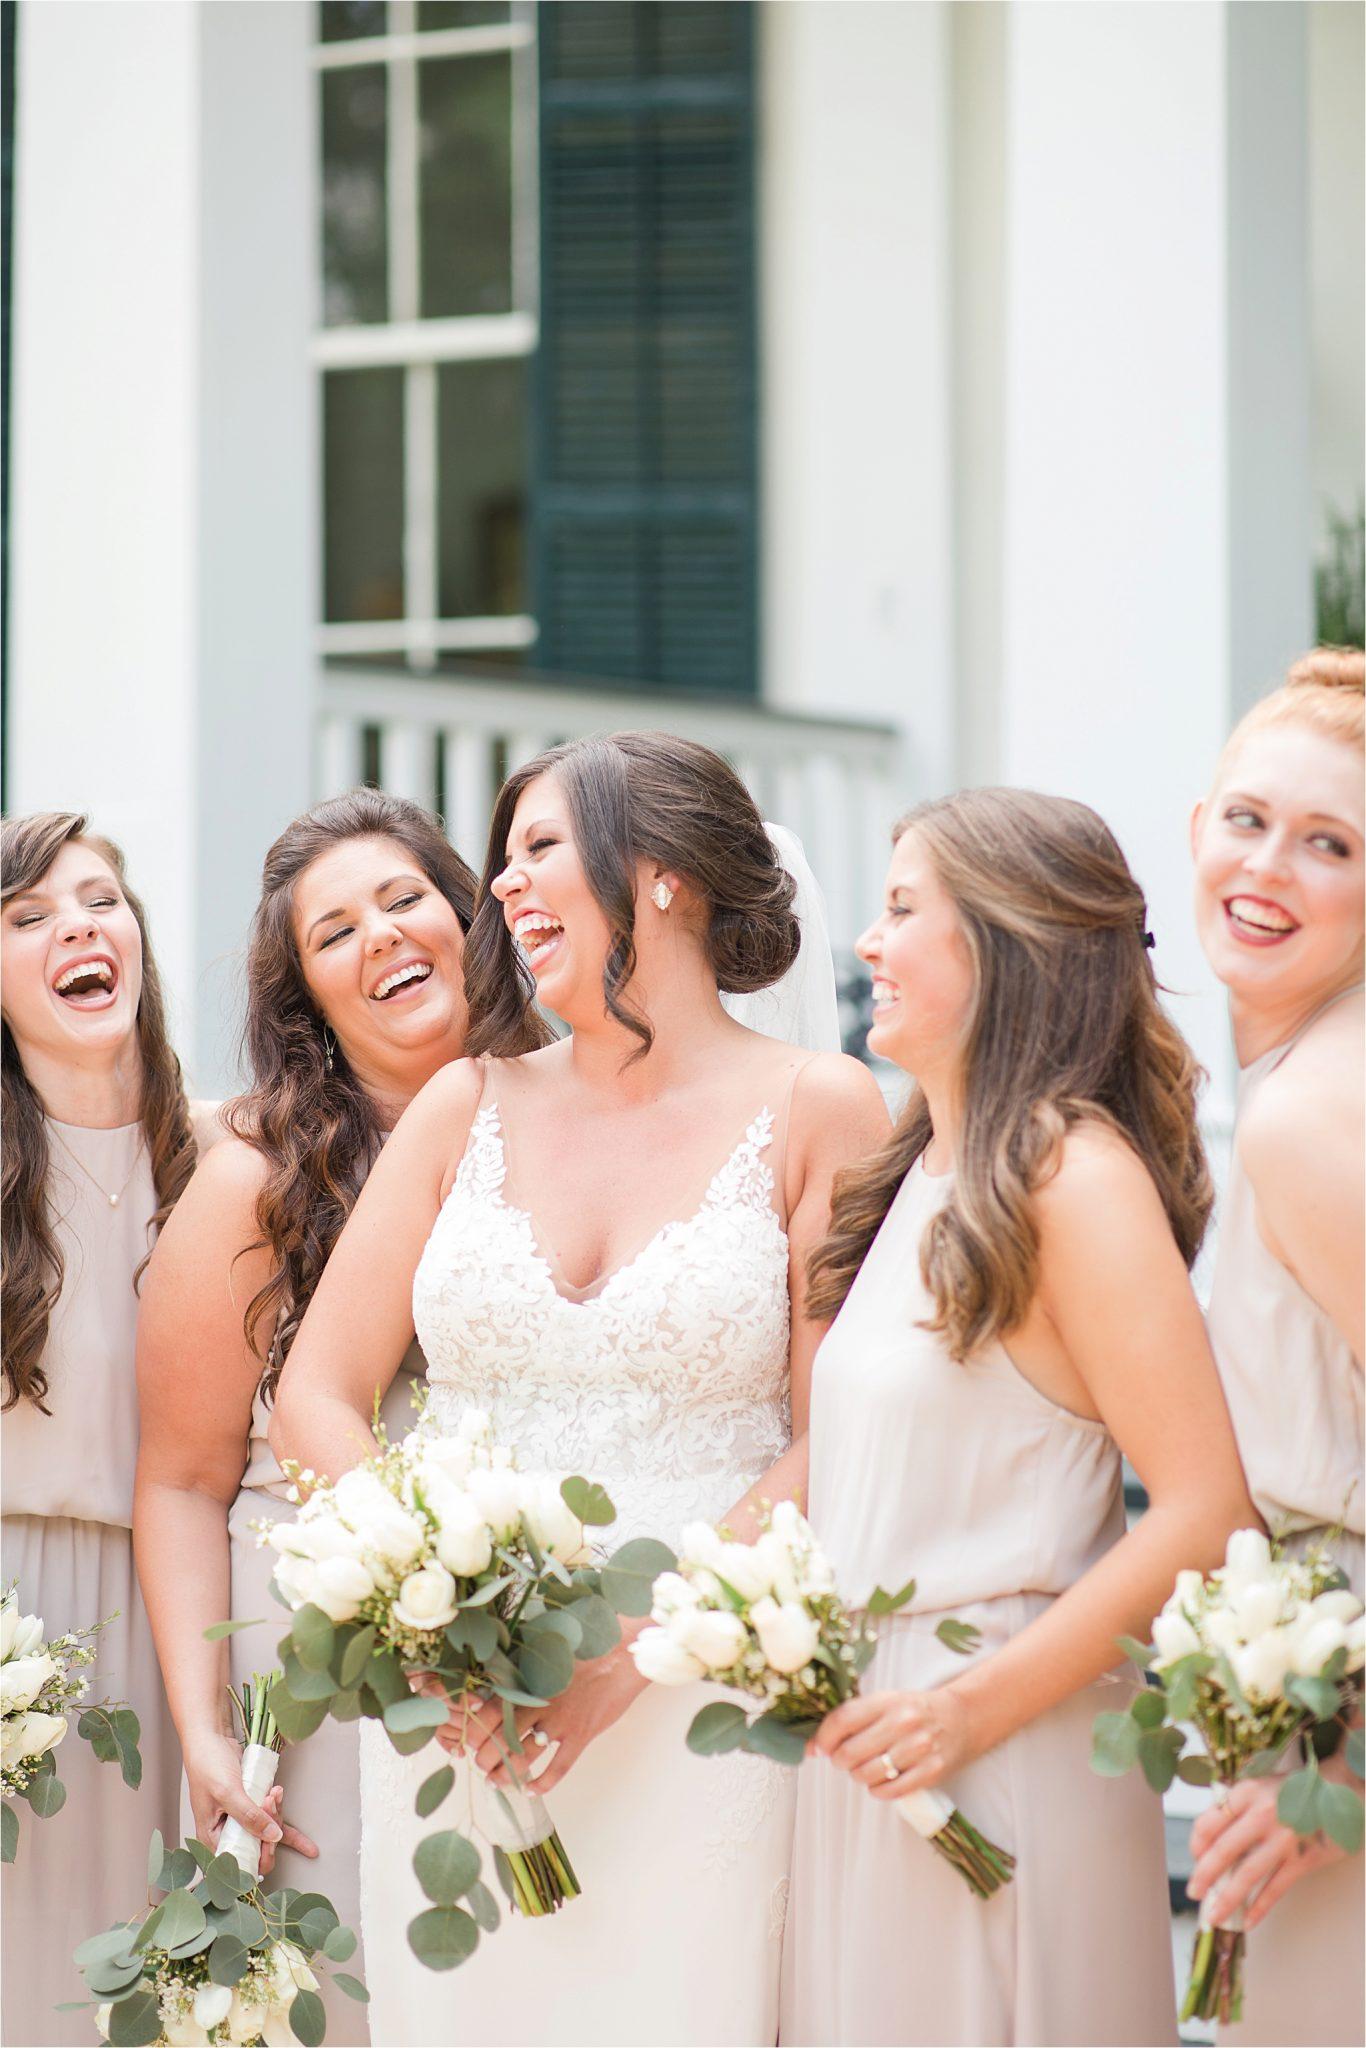 Hedge Farm Wedding, Alabama Wedding Photographer, Barn Wedding, Bride and bridesmaids, Neutrals